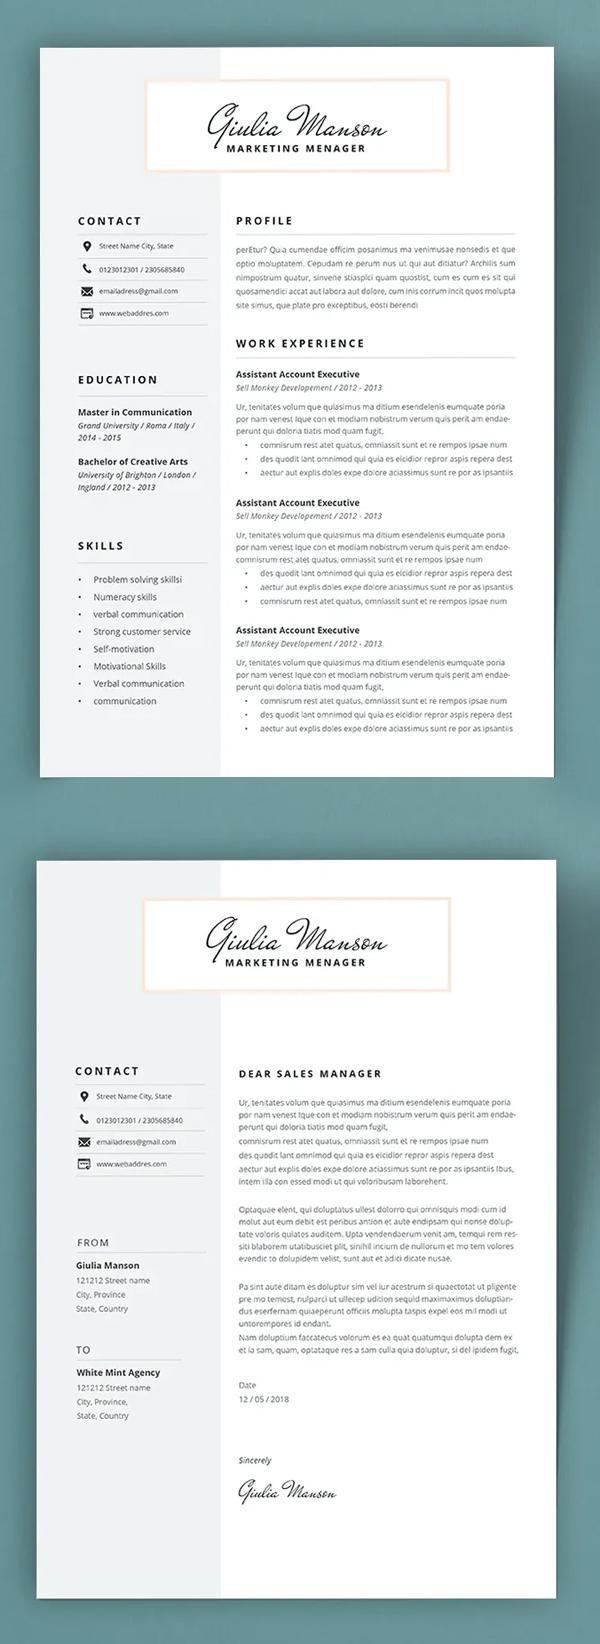 Simple Clean Resume / CV Template Font